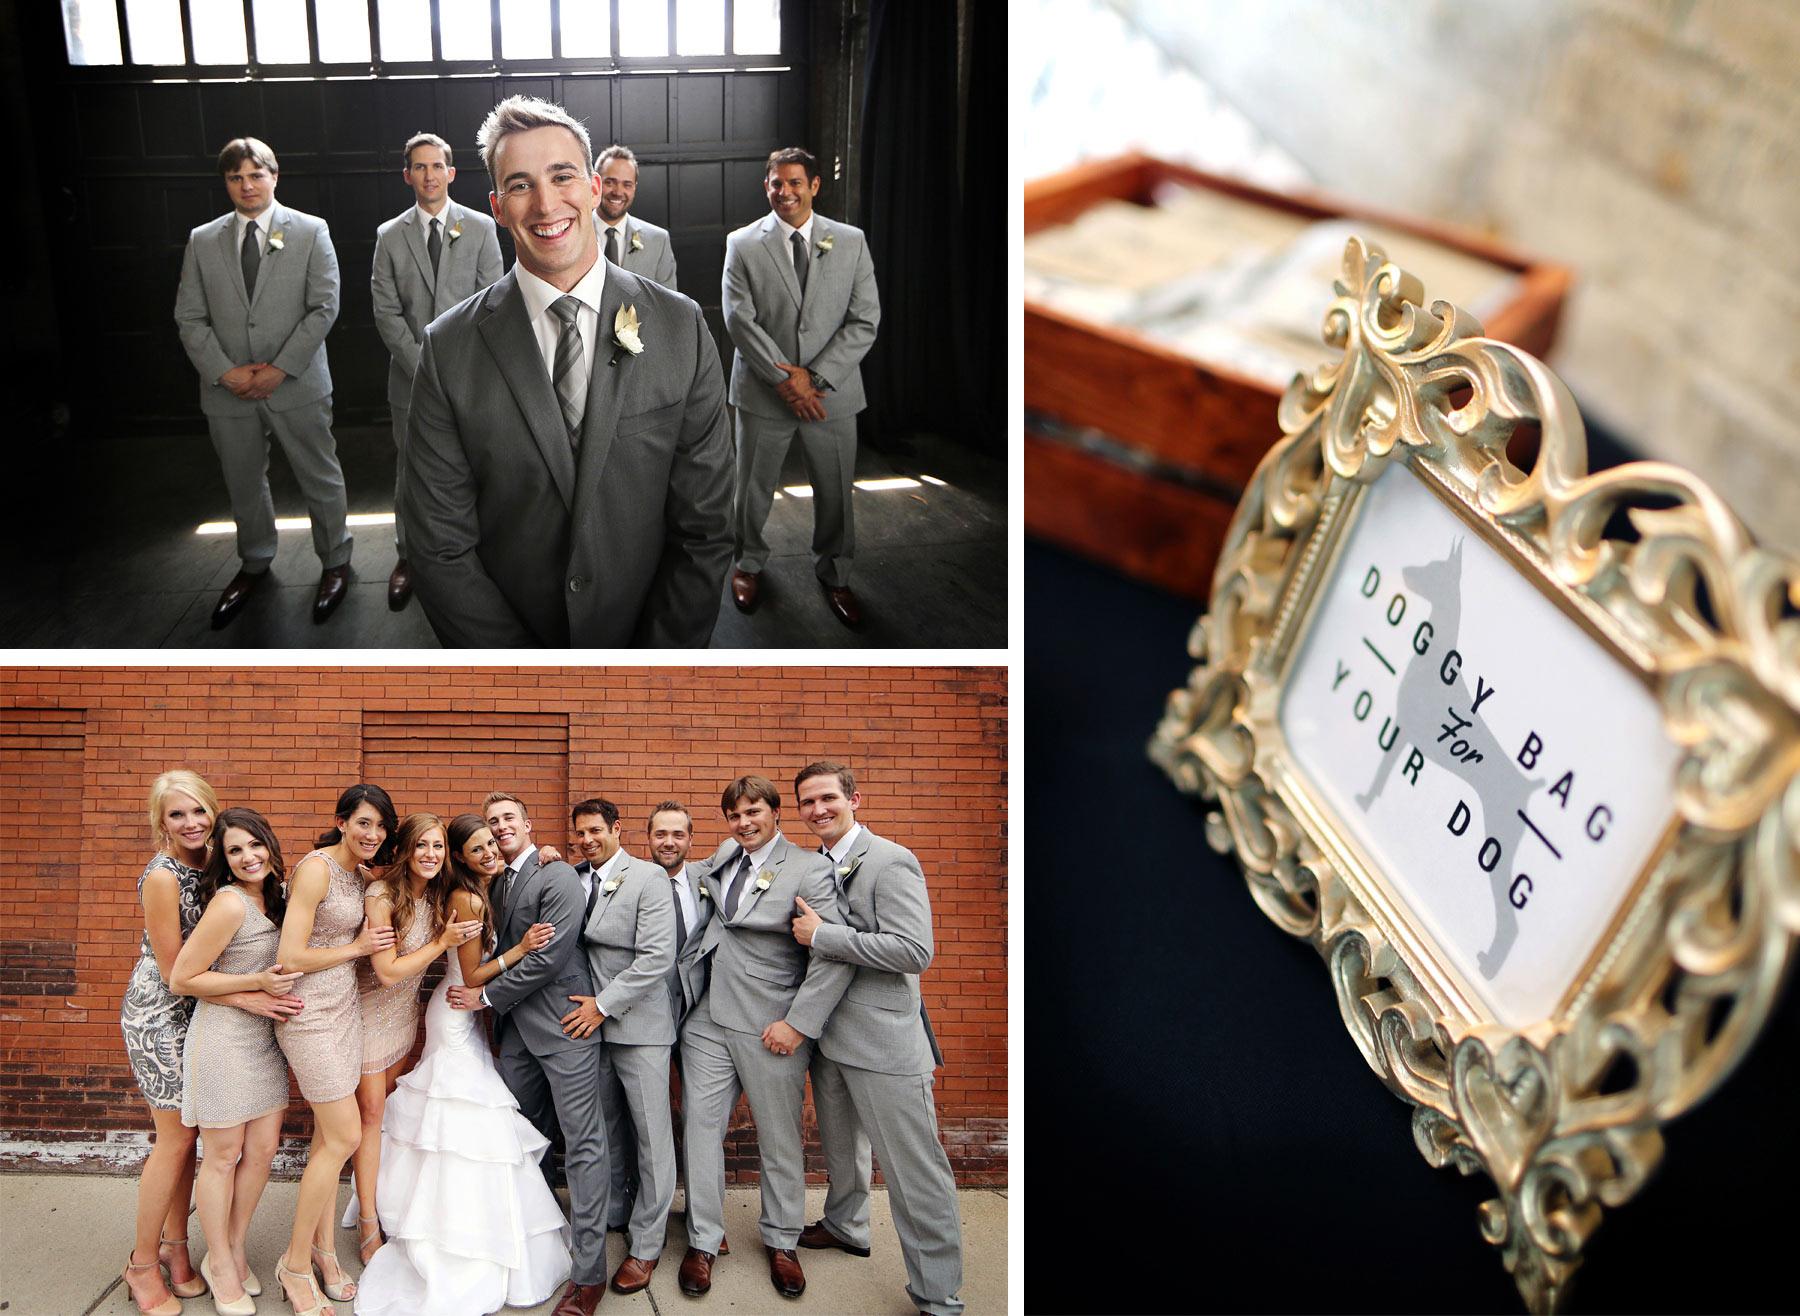 15-Minneapolis-Minnesota-Wedding-Photography-by-Vick-Photography-Aria-Wedding-Party-Katie-&-Joe.jpg